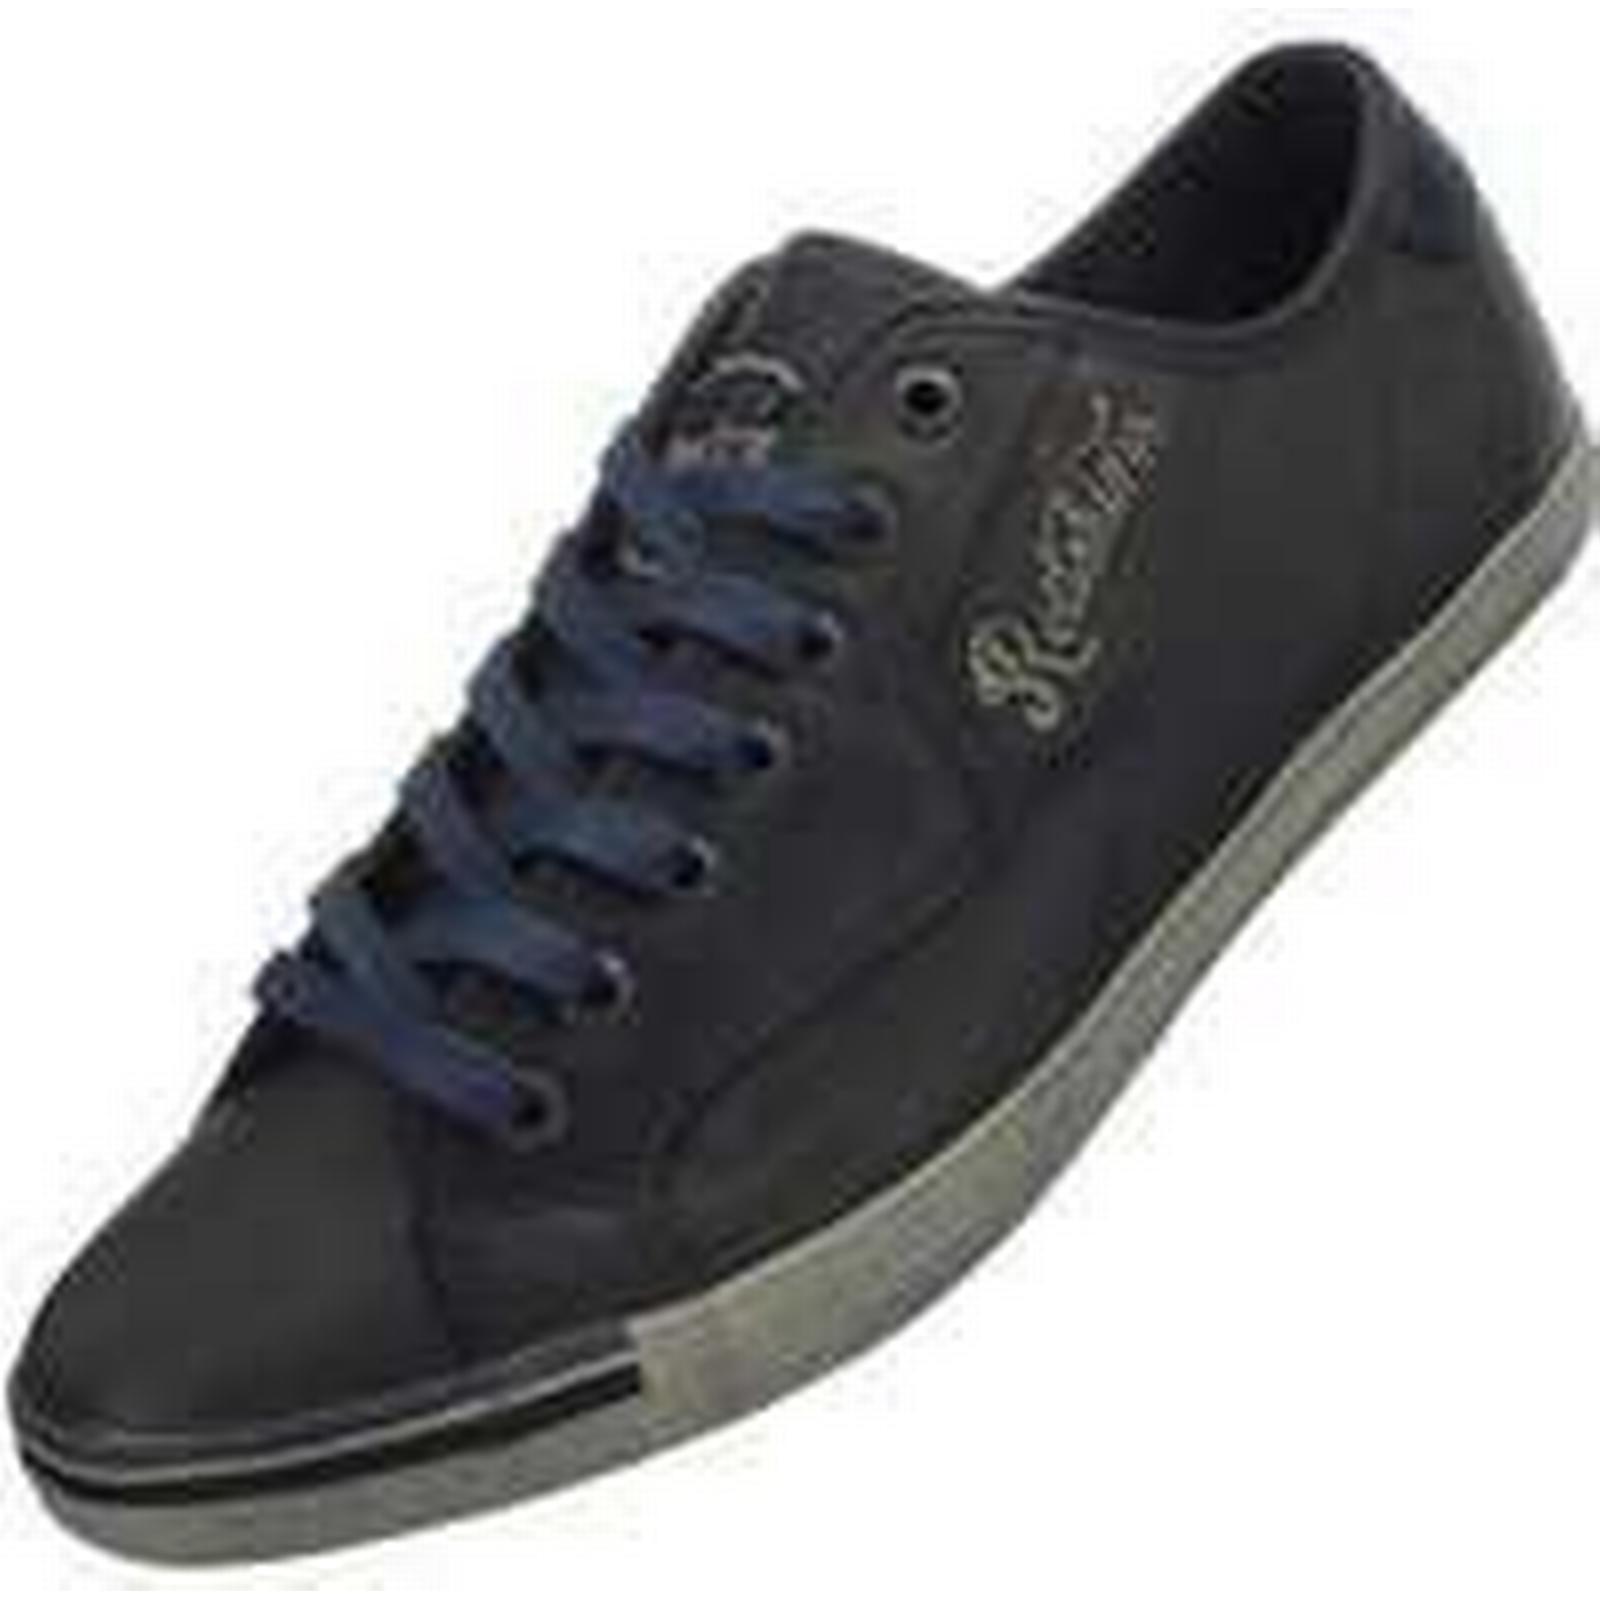 Spartoo.co.uk men's Redskins Upward men's Spartoo.co.uk Shoes (Trainers) in Blue cfc9fc